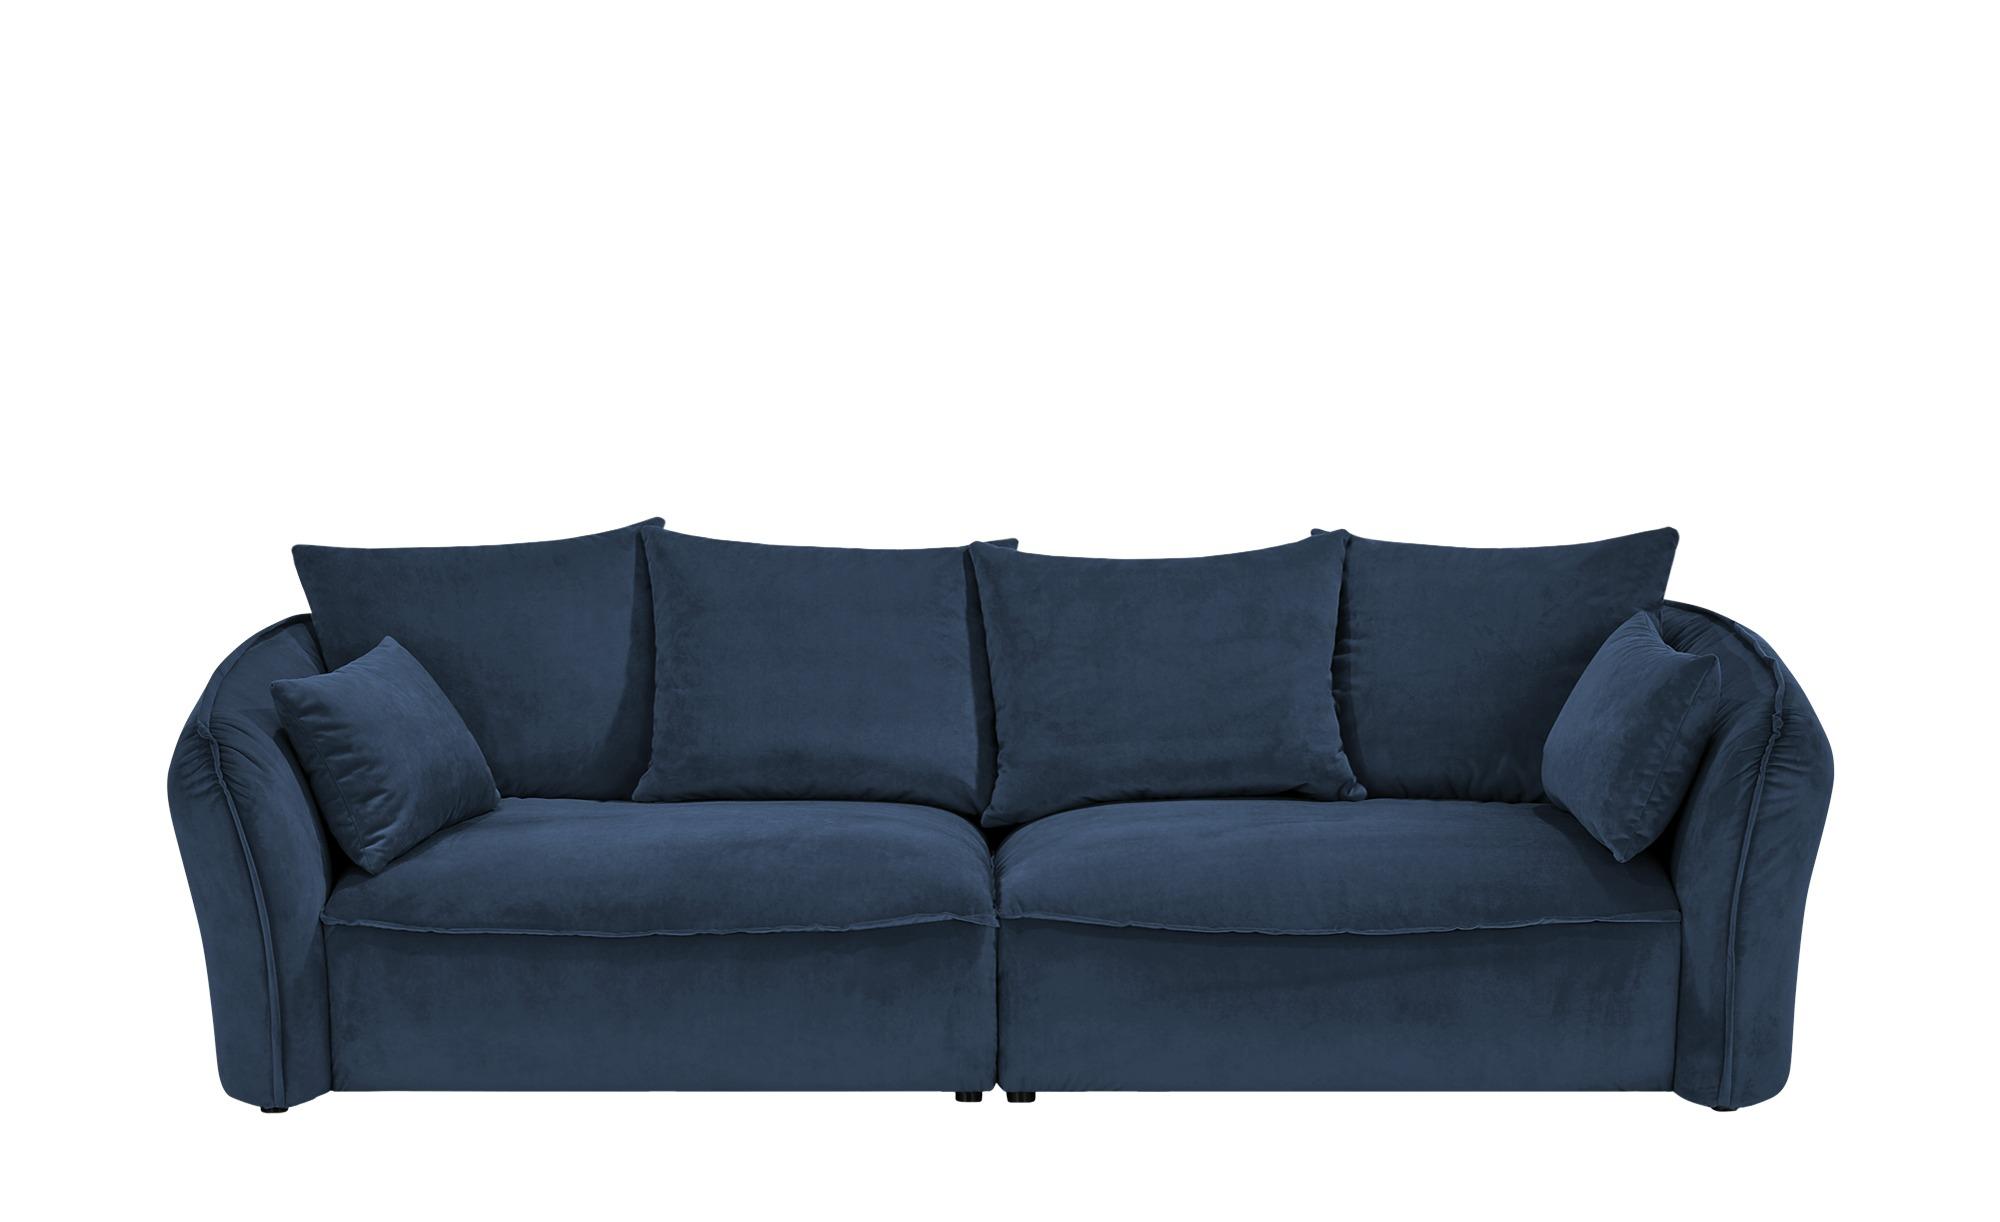 Megasofa  Yale ¦ blau ¦ Maße (cm): B: 280 H: 75 T: 118 Polstermöbel > Sofas > Einzelsofas - Höffner